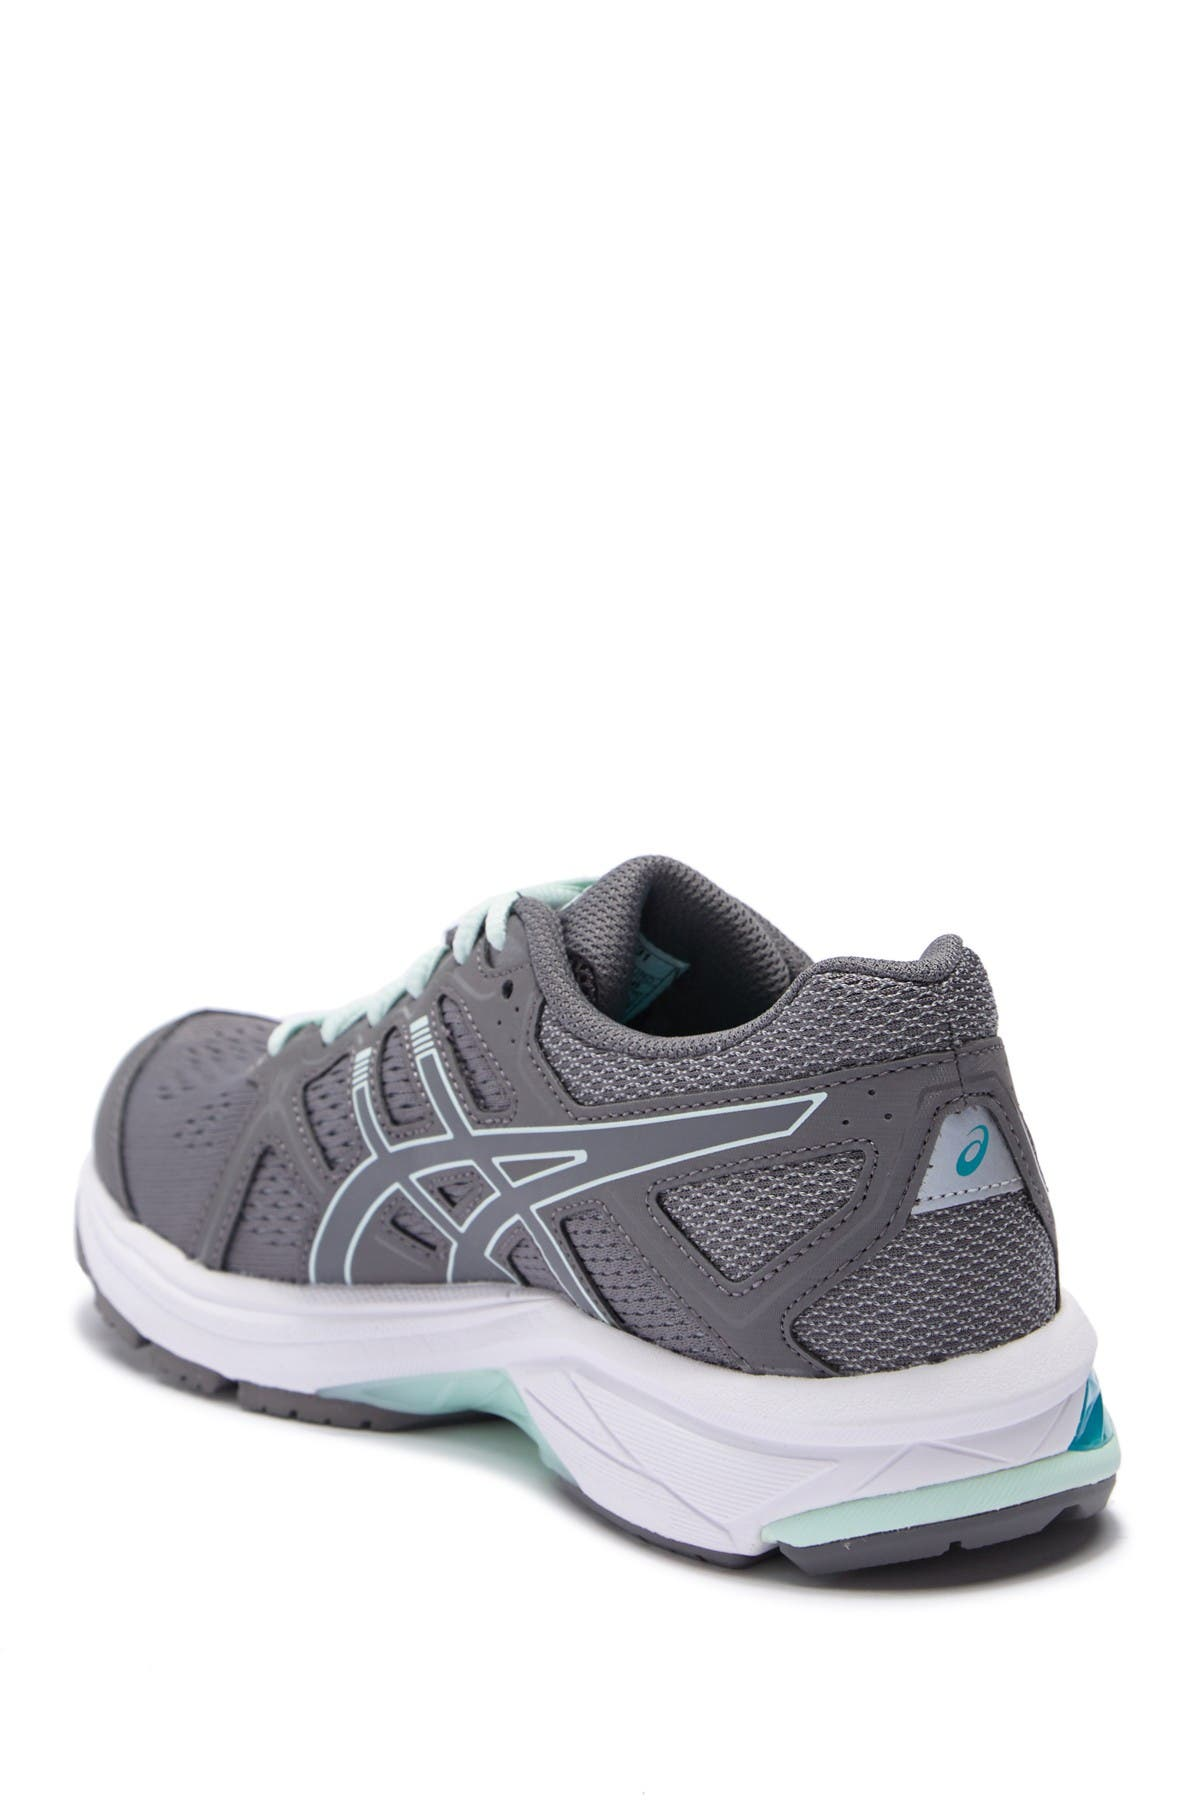 Image of ASICS GT-Xpress Running Sneaker